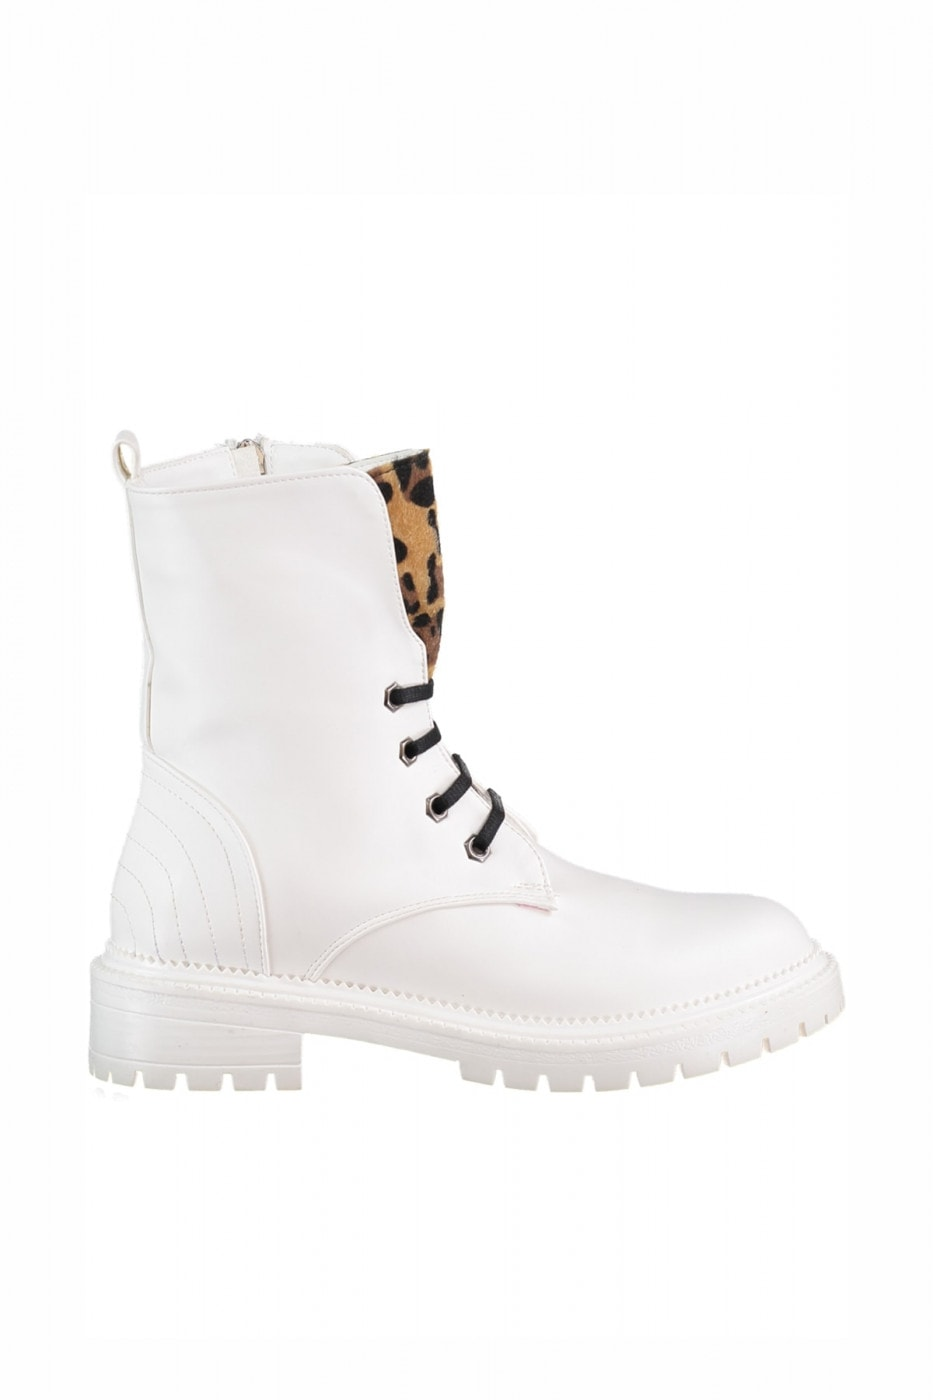 Trendyol White Thai Feather Detailed Women's Boots